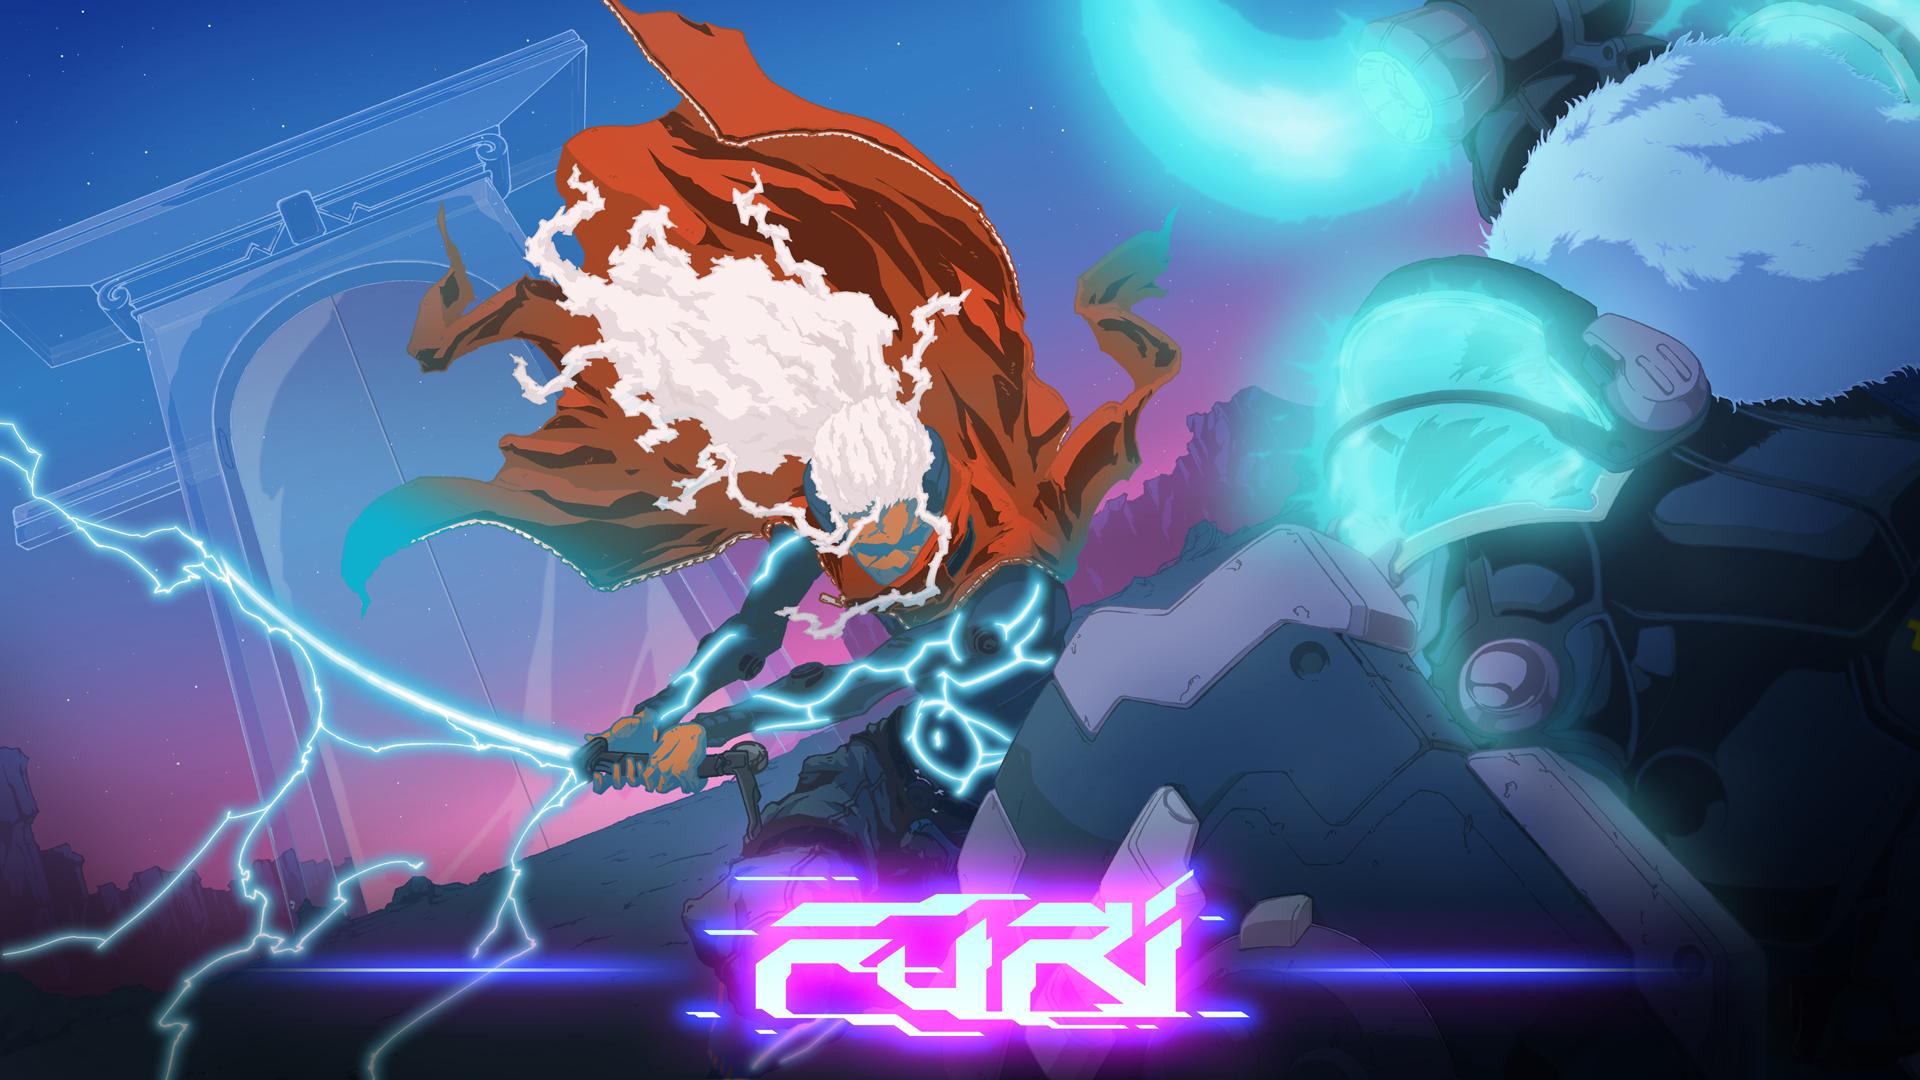 Furi (Nintendo Switch Digital Download) $6.99 via Nintendo eShop